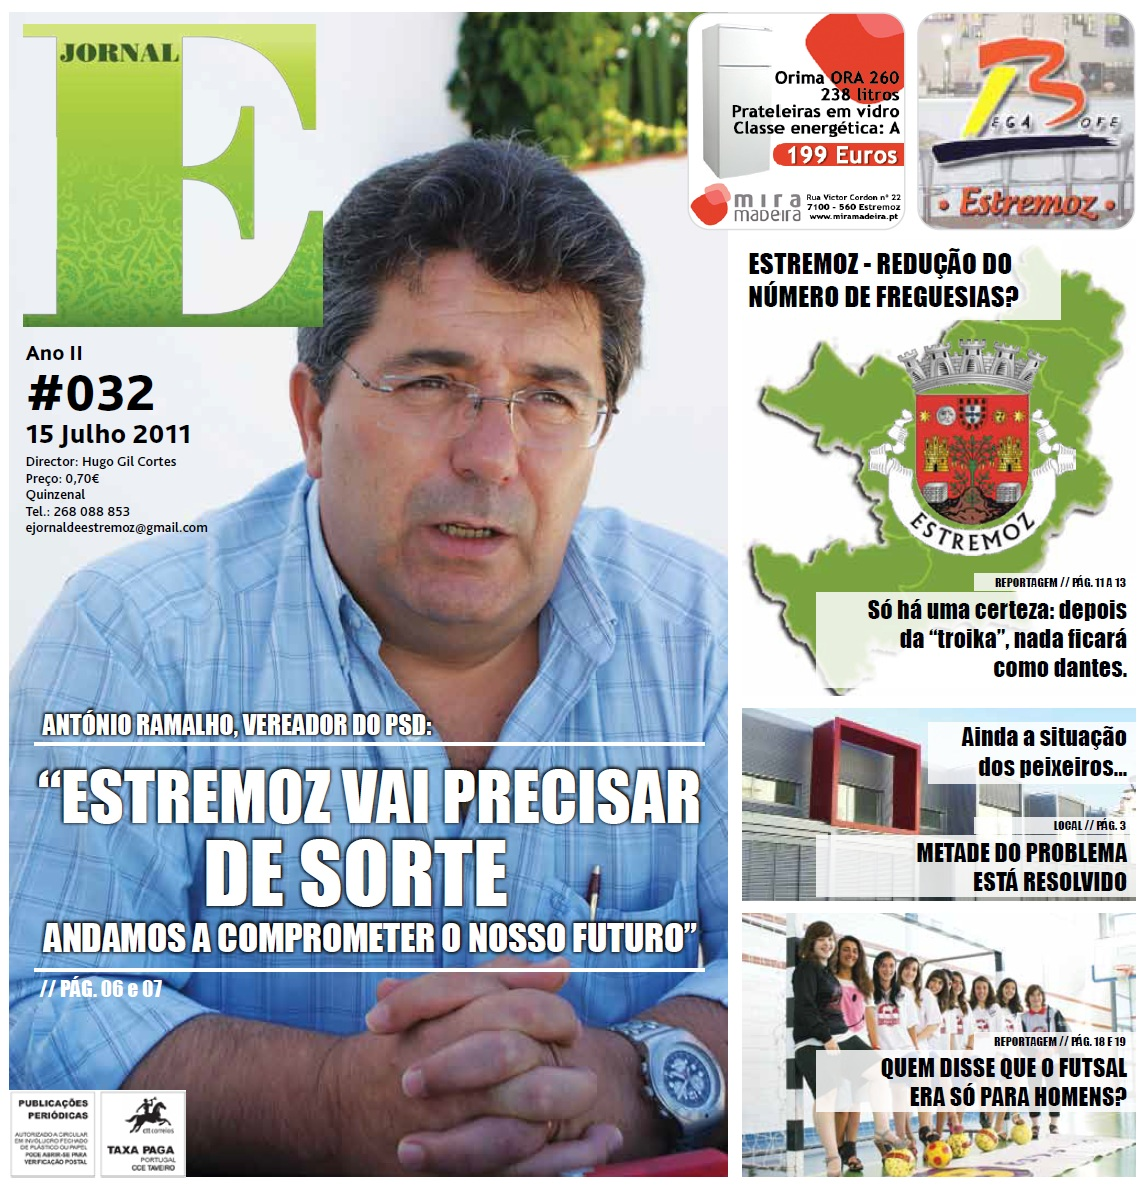 CapaJornalE32